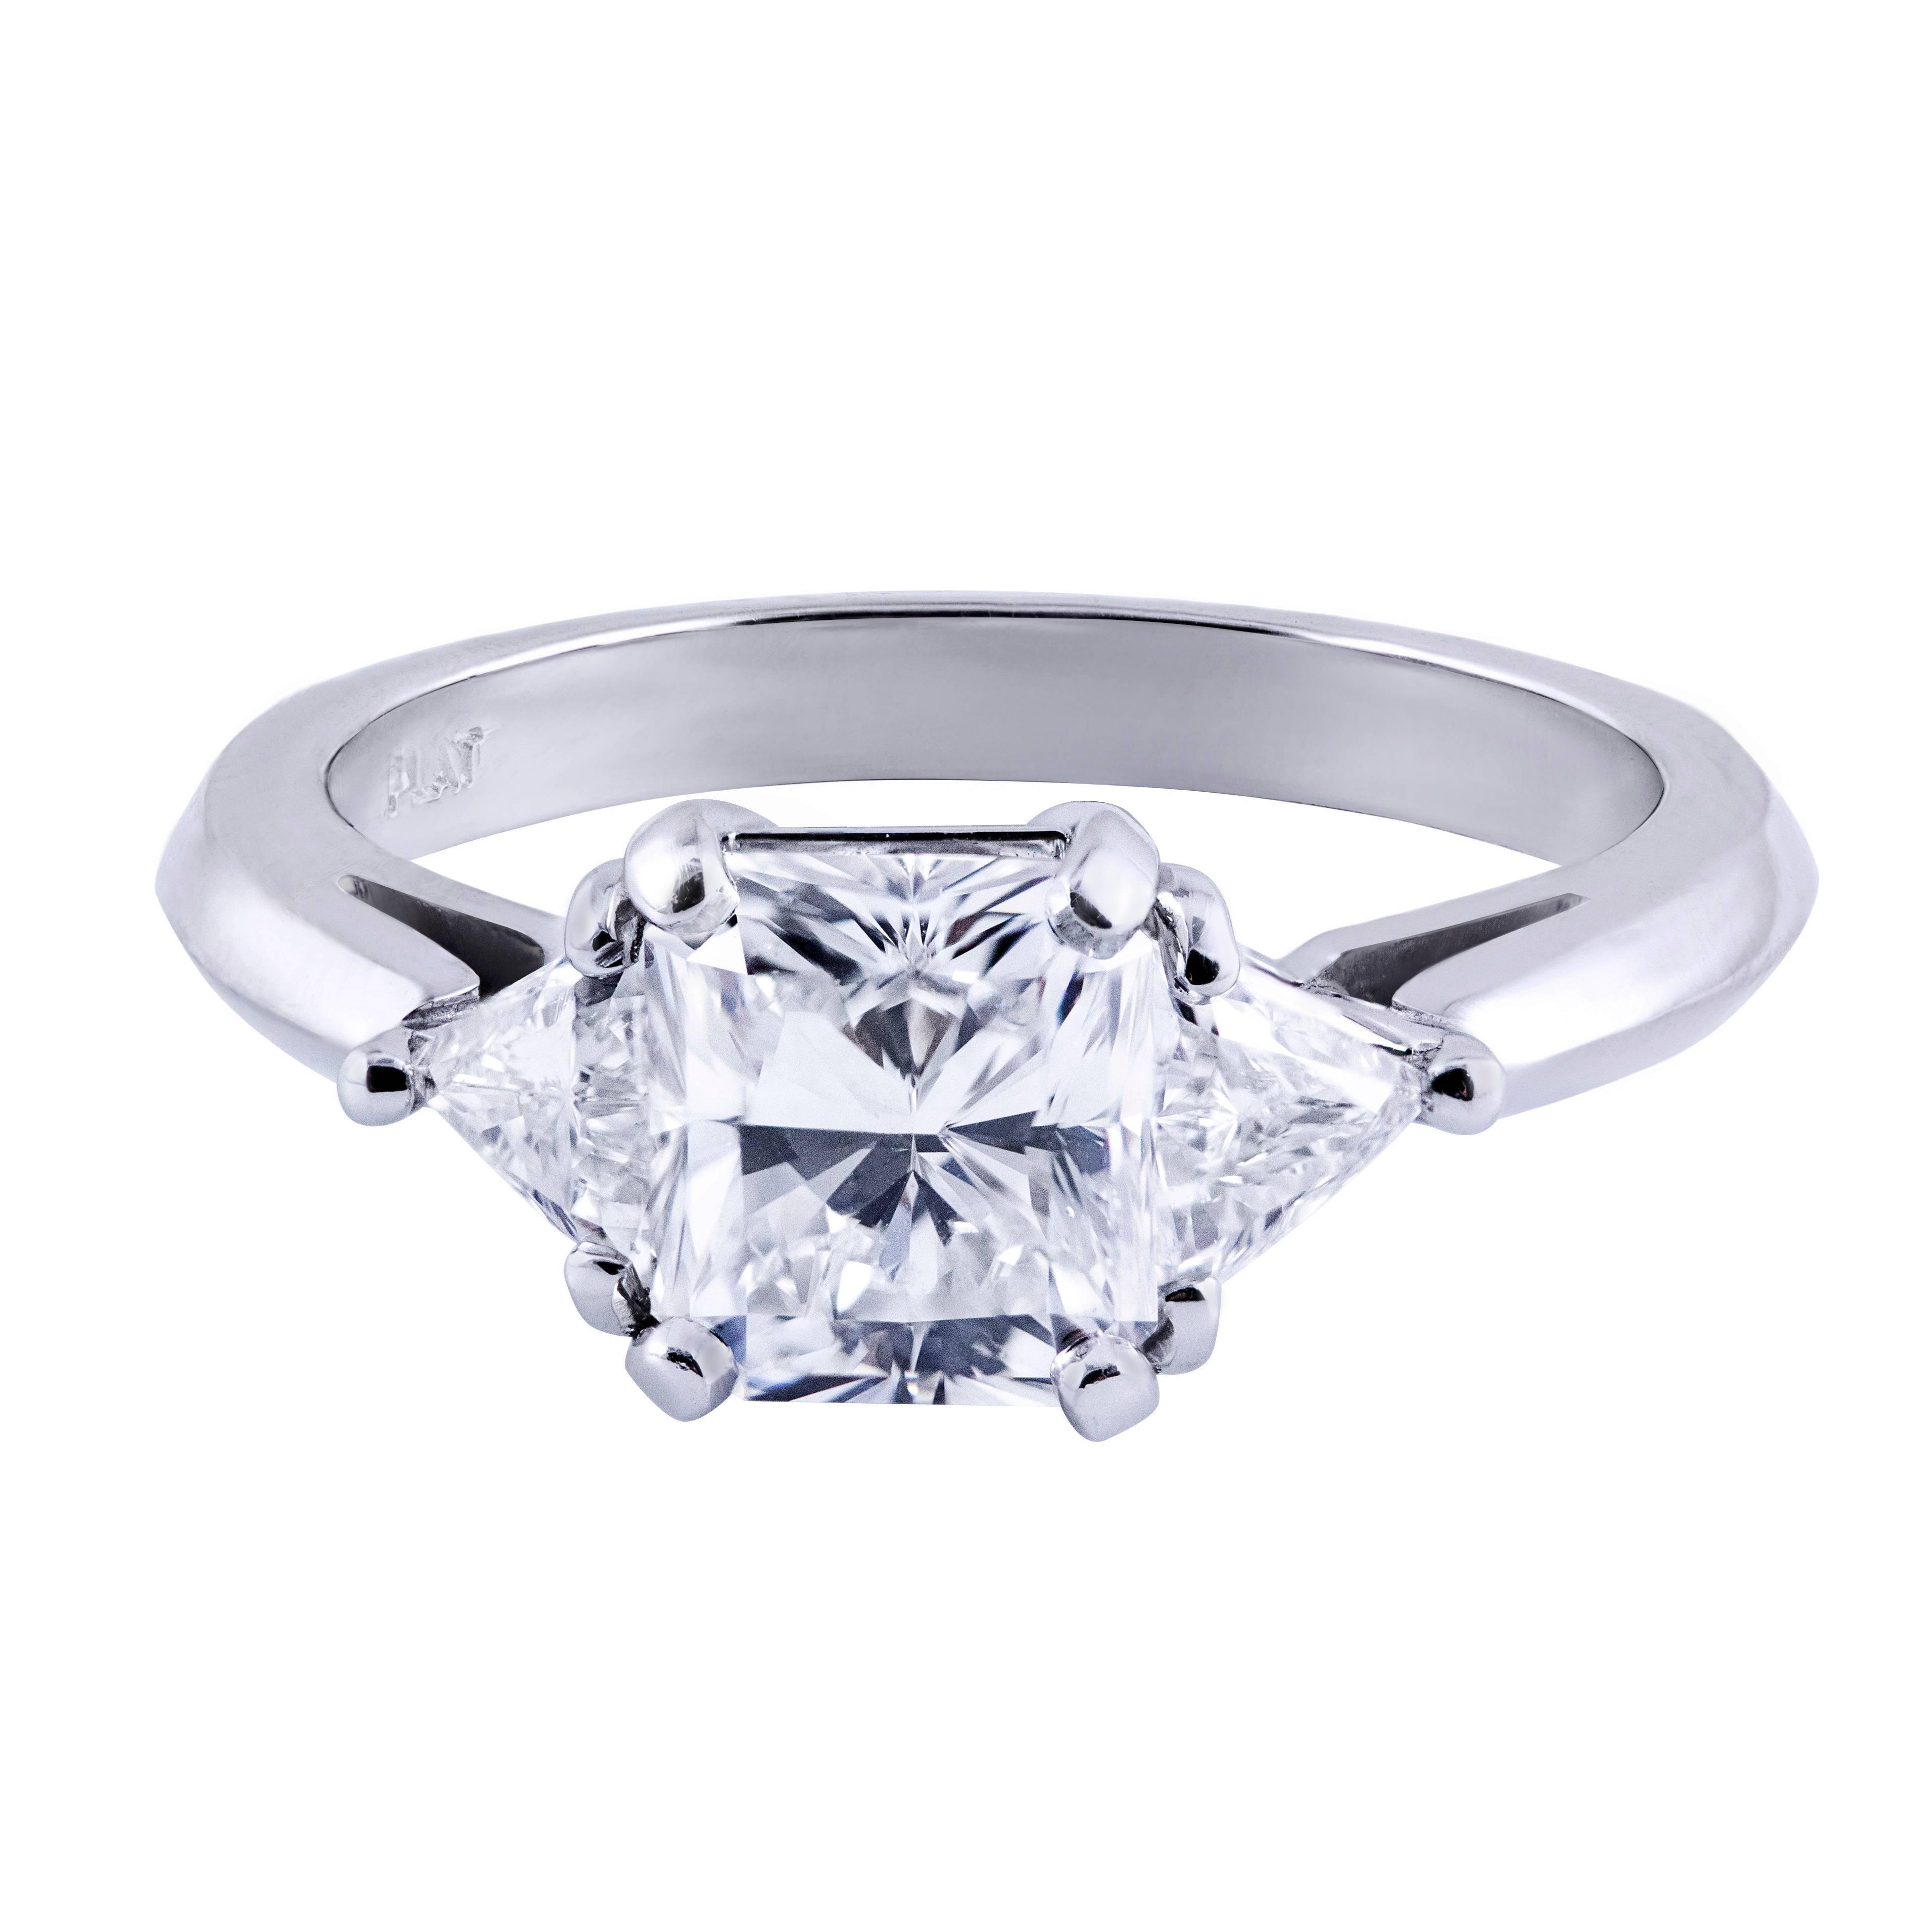 GIA Certified Radiant Cut Diamond Three-Stone Engagement Ring